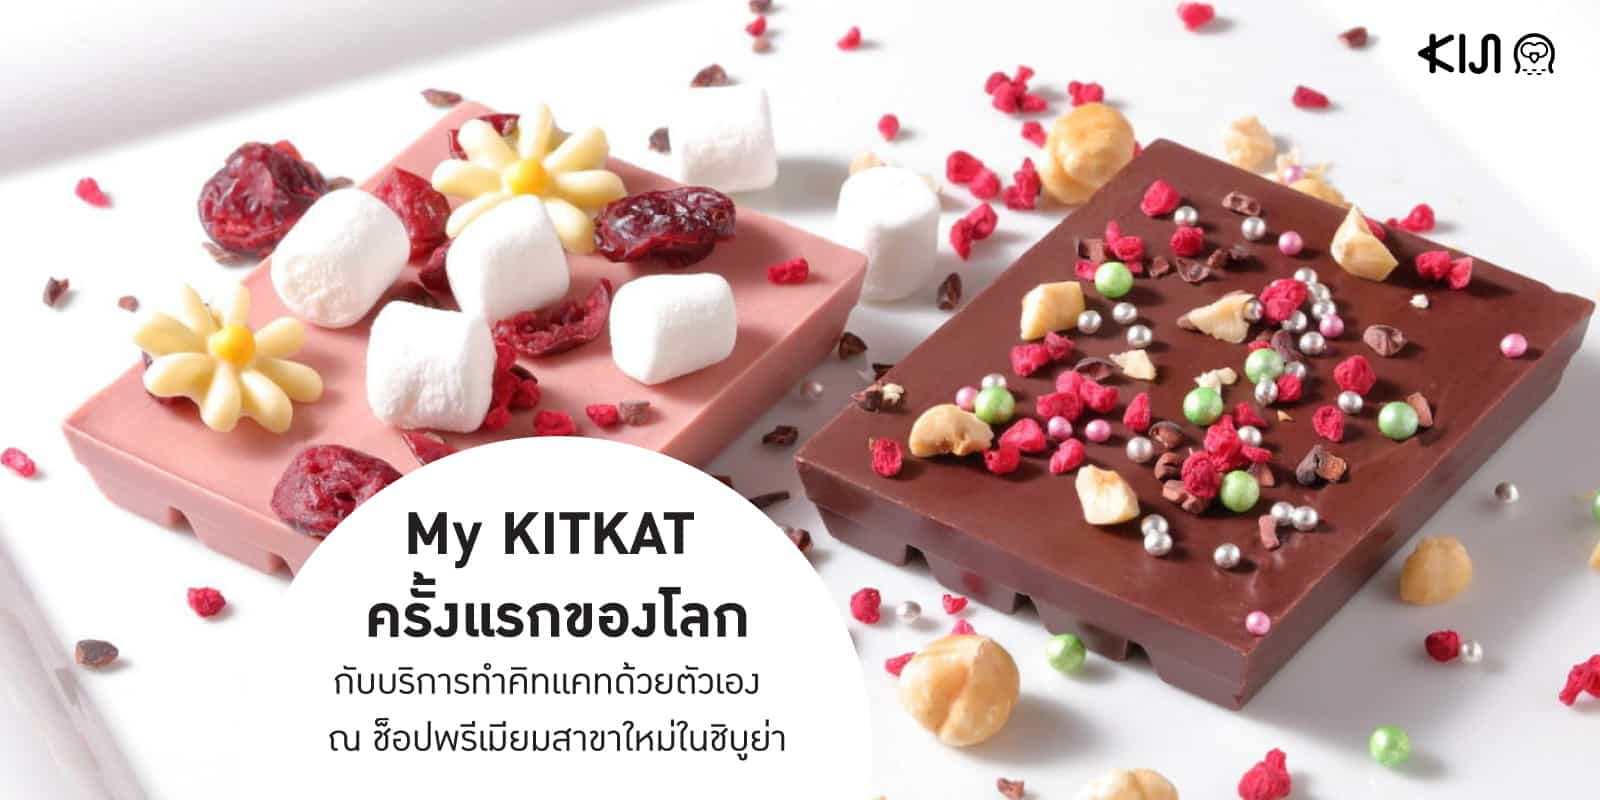 KITKAT Chocolatory คิทแคท โตเกียว